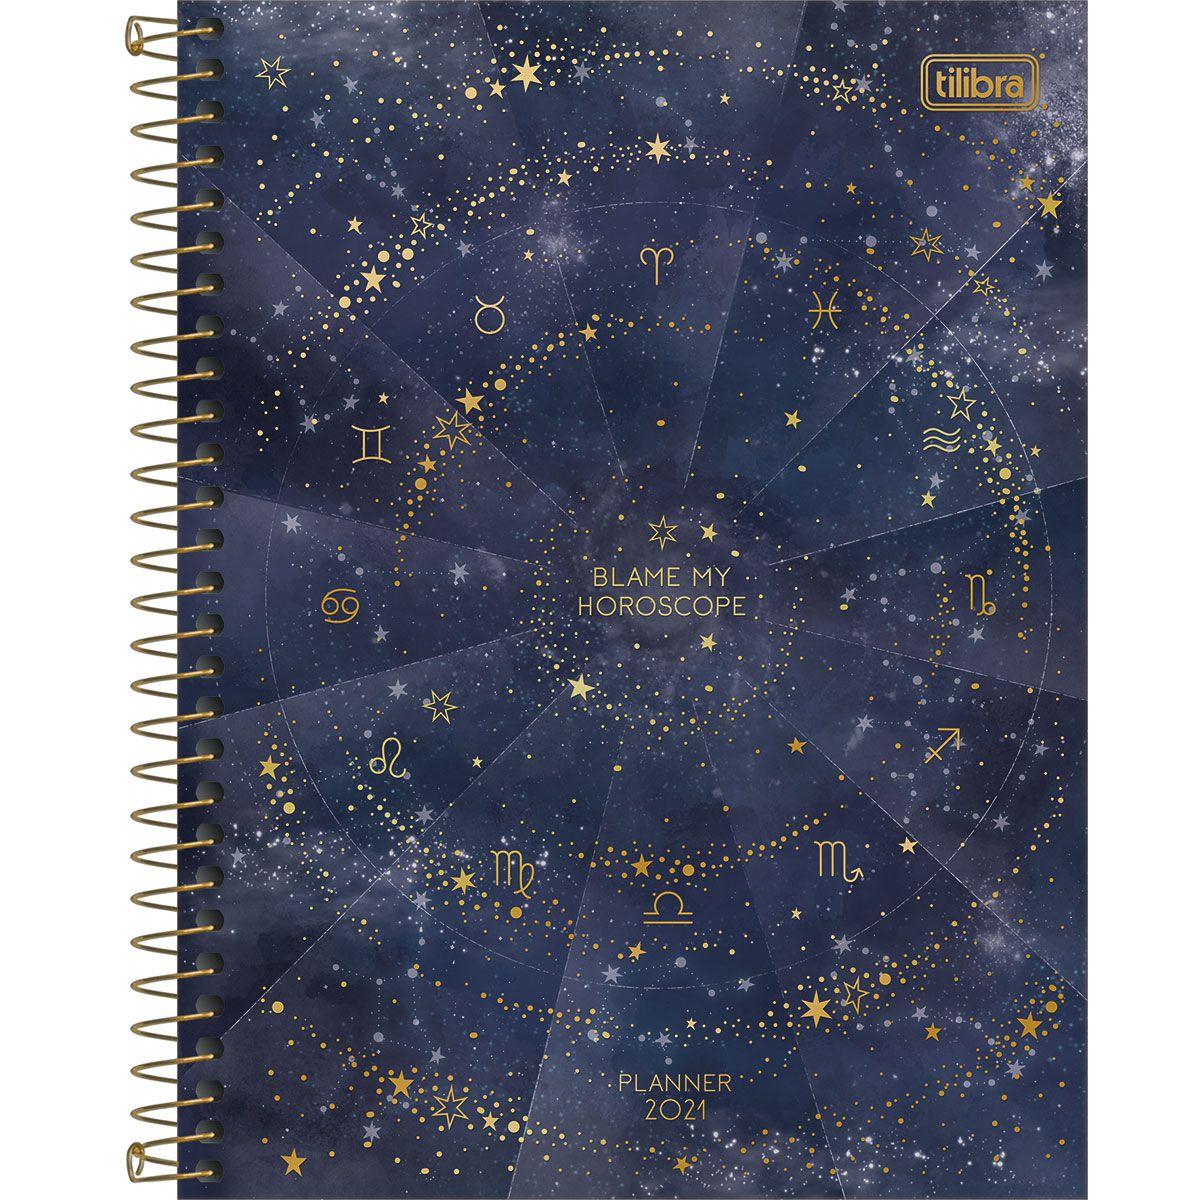 Planner semanal 2021 espiral 80 fls Magic M7 Tilibra